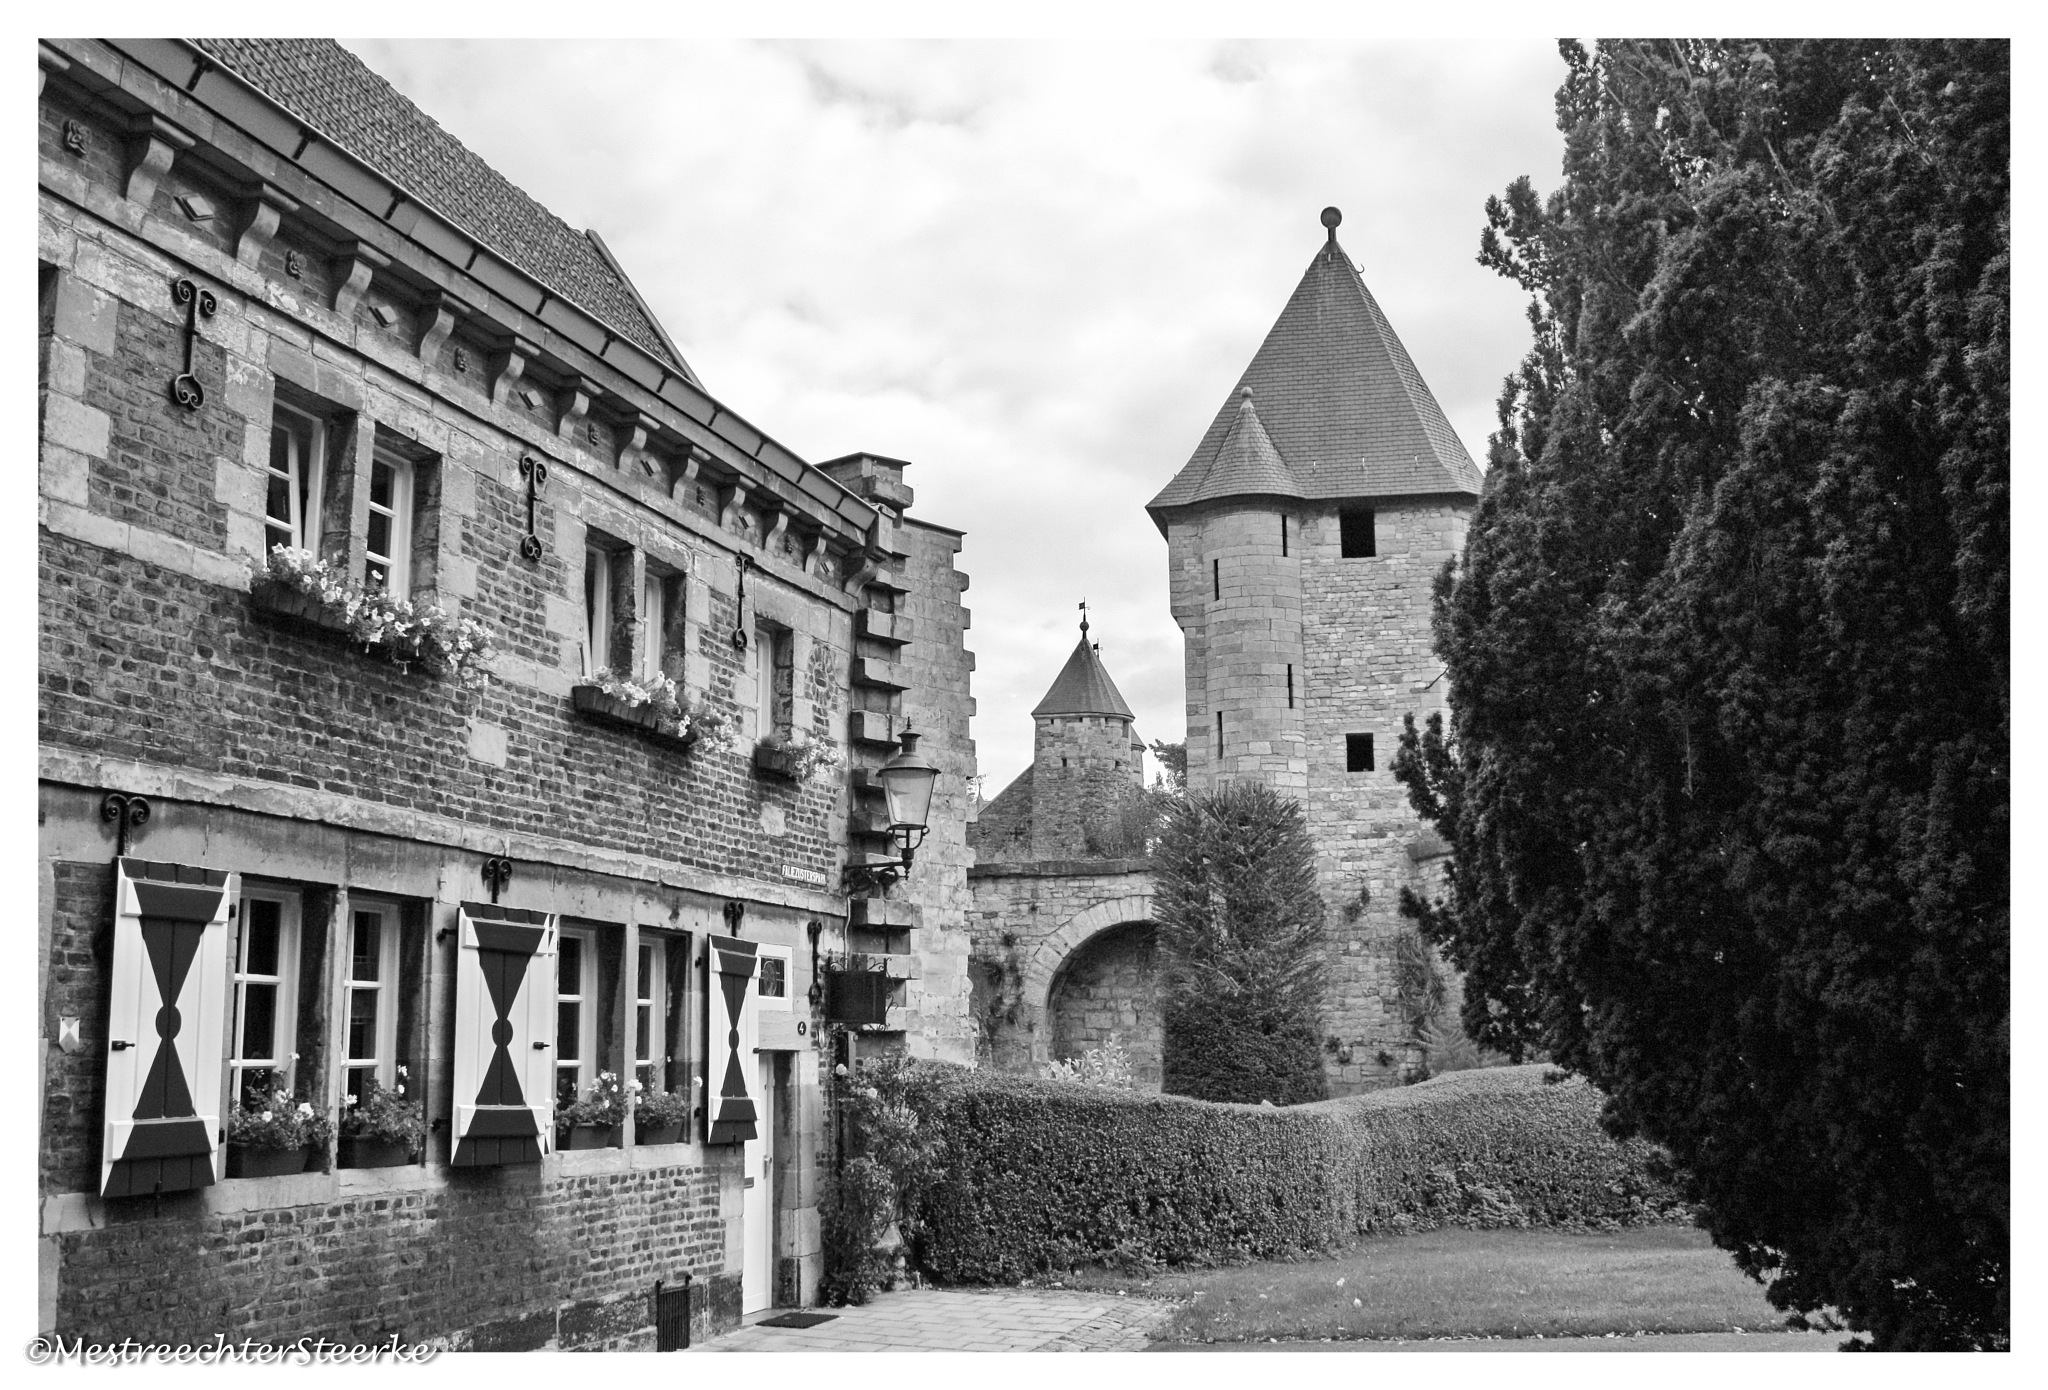 Monastery and Towers by John Kerkhofs